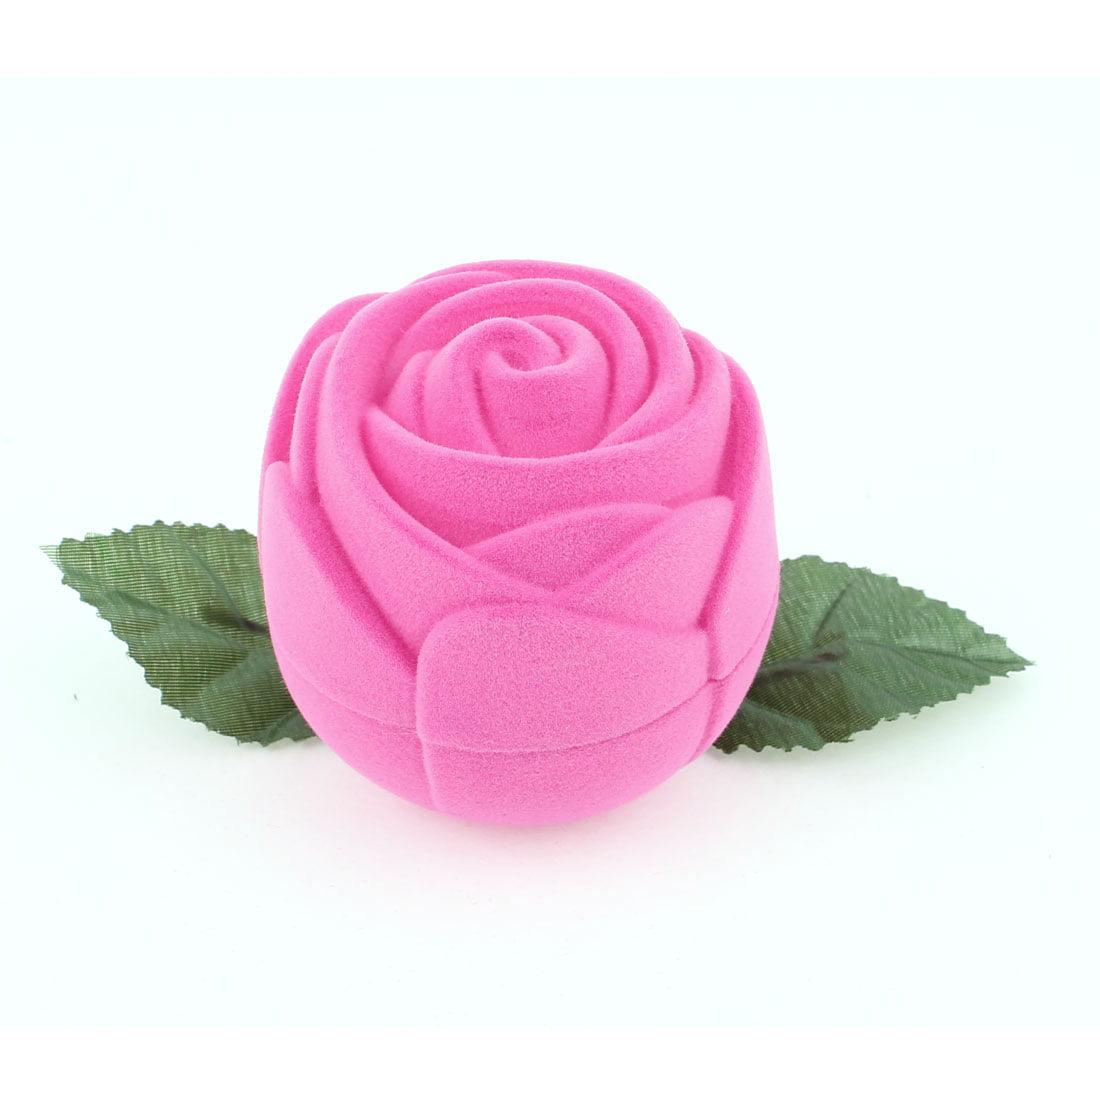 flannel coated rose shape jewelry storage wedding ring holder case